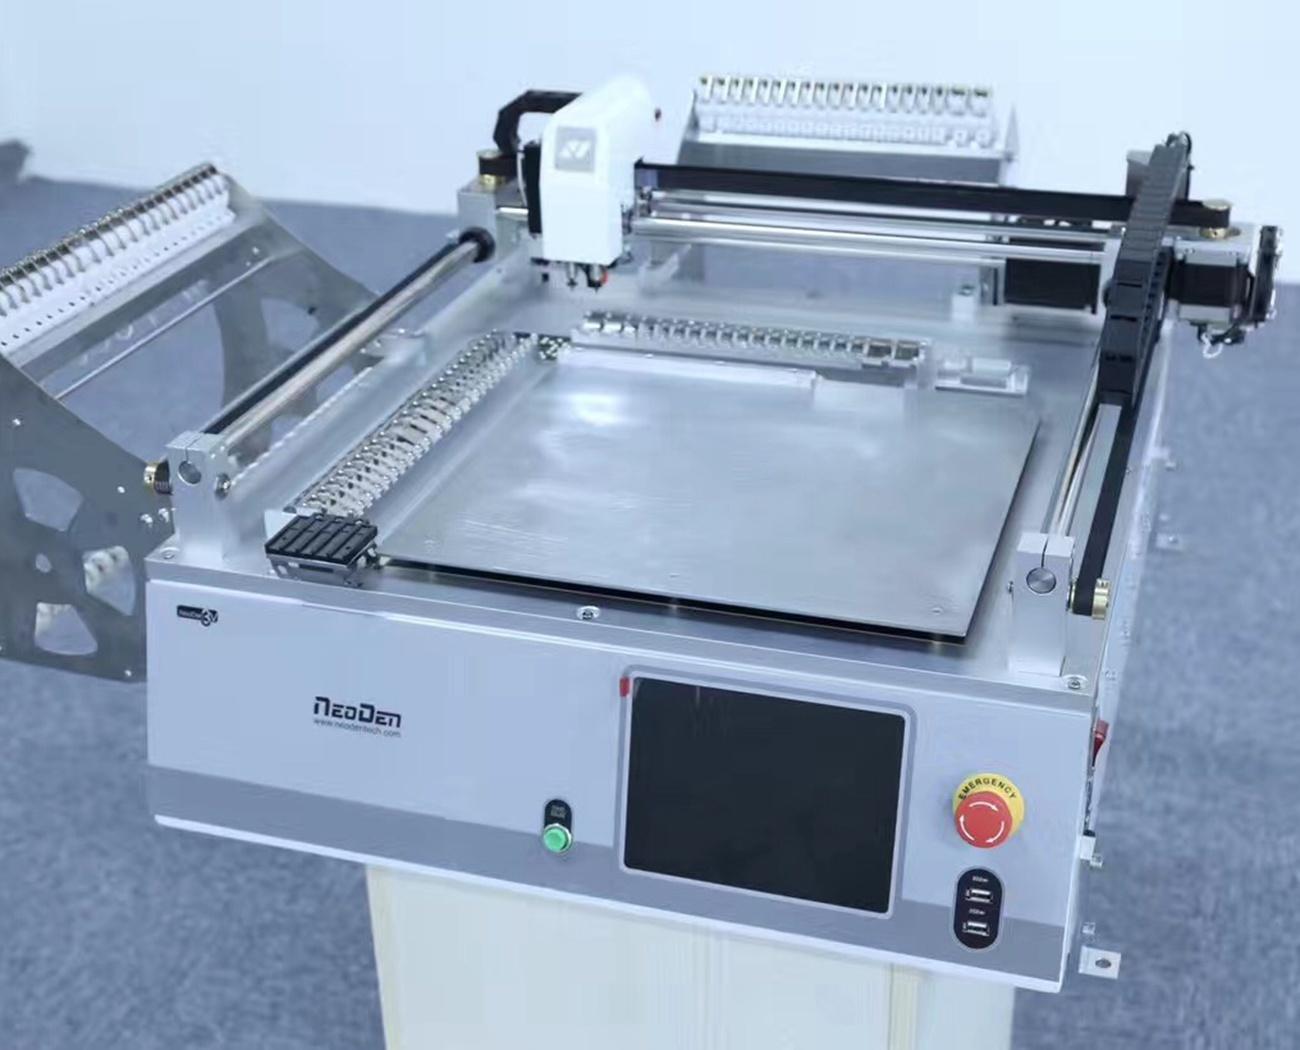 [Hot Item] PCB Assembly Machine Neoden3V for SMT Prototype, Popular in EU,  USA